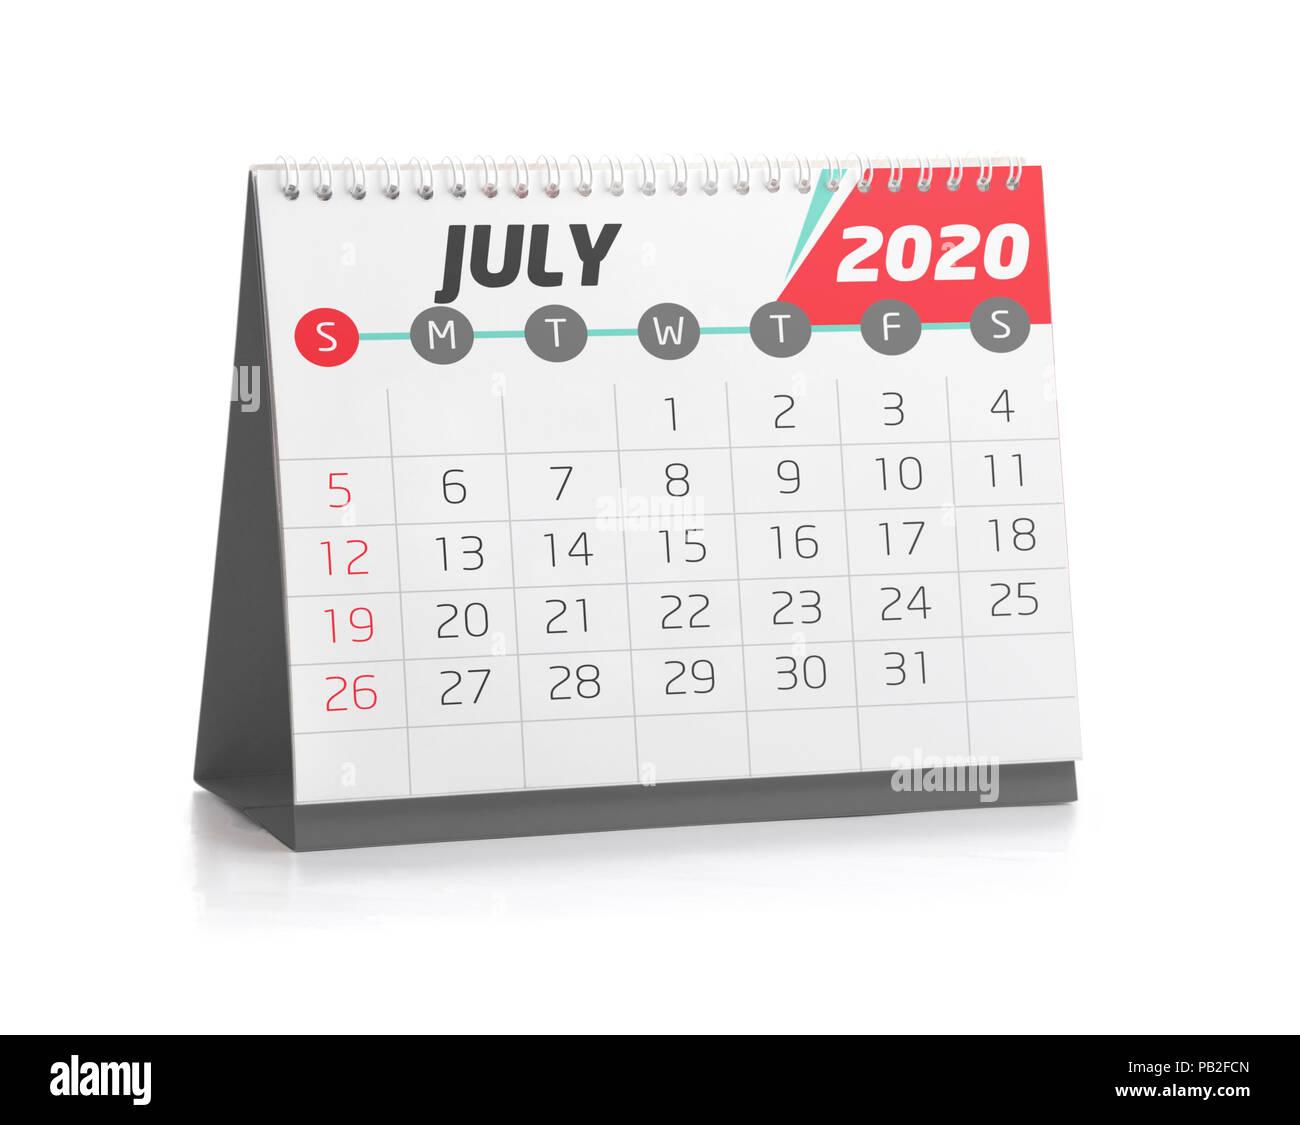 Calendrier Juillet2020.Calendrier De Bureau Blanc Juillet 2020 Isolated On White